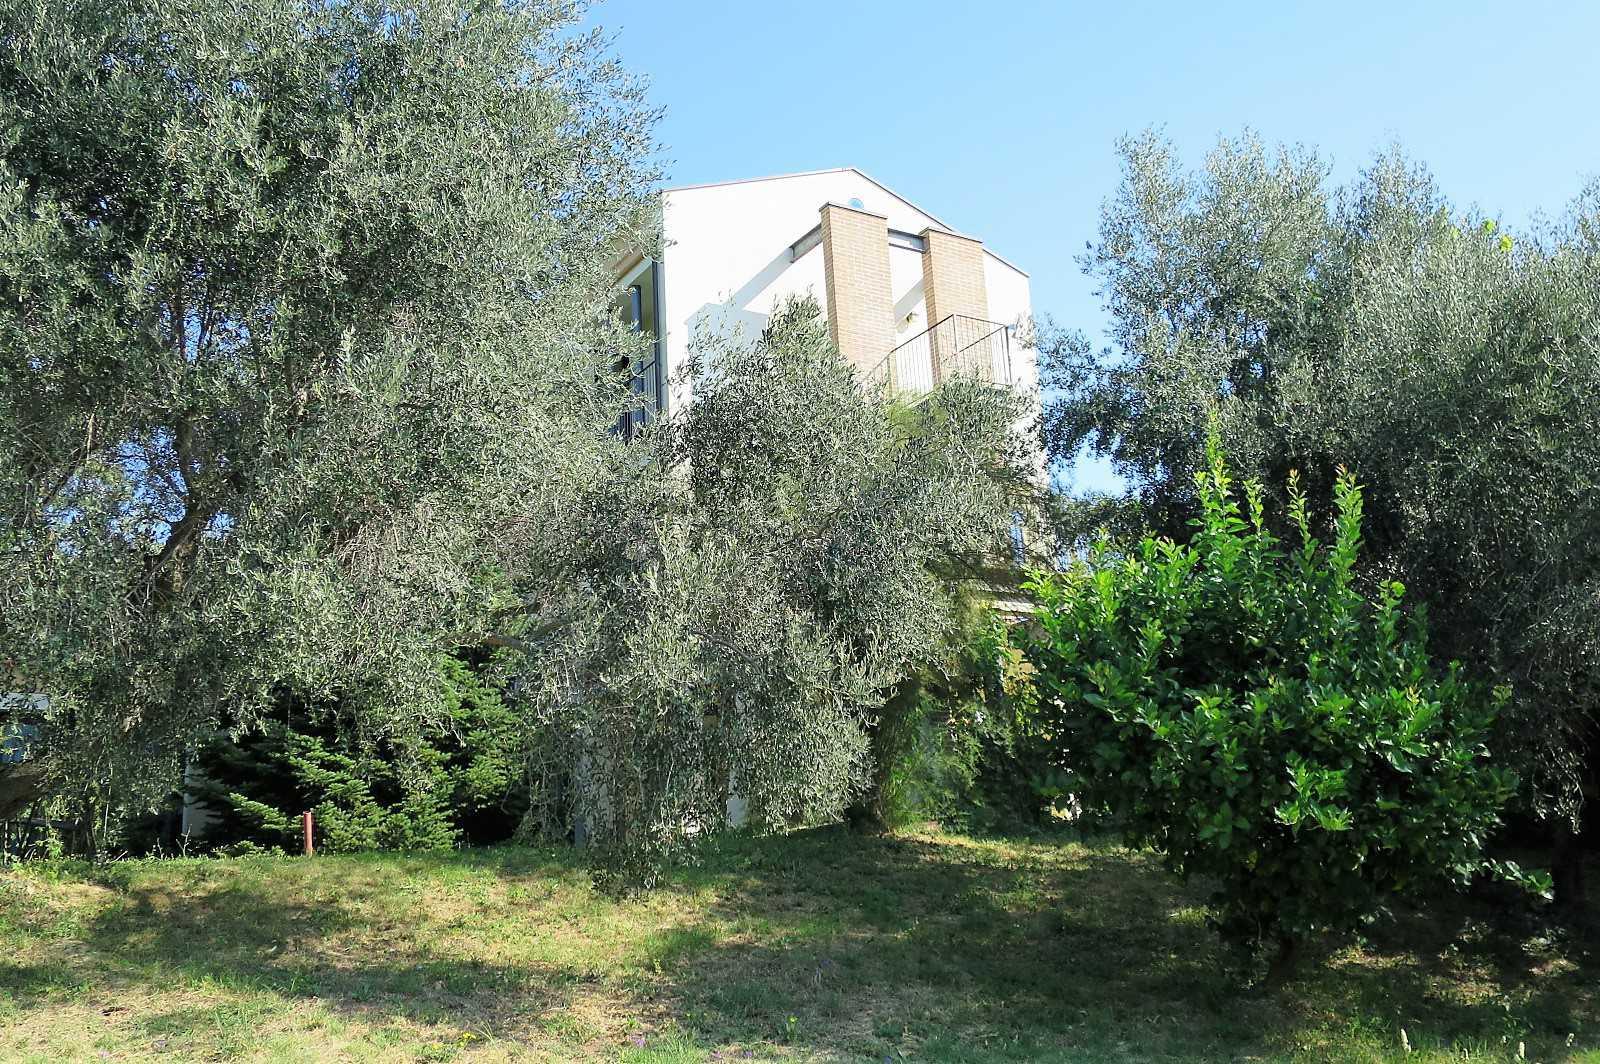 Villa Villa in vendita Atri (TE), Villa Paola - Atri - EUR 471.071 310